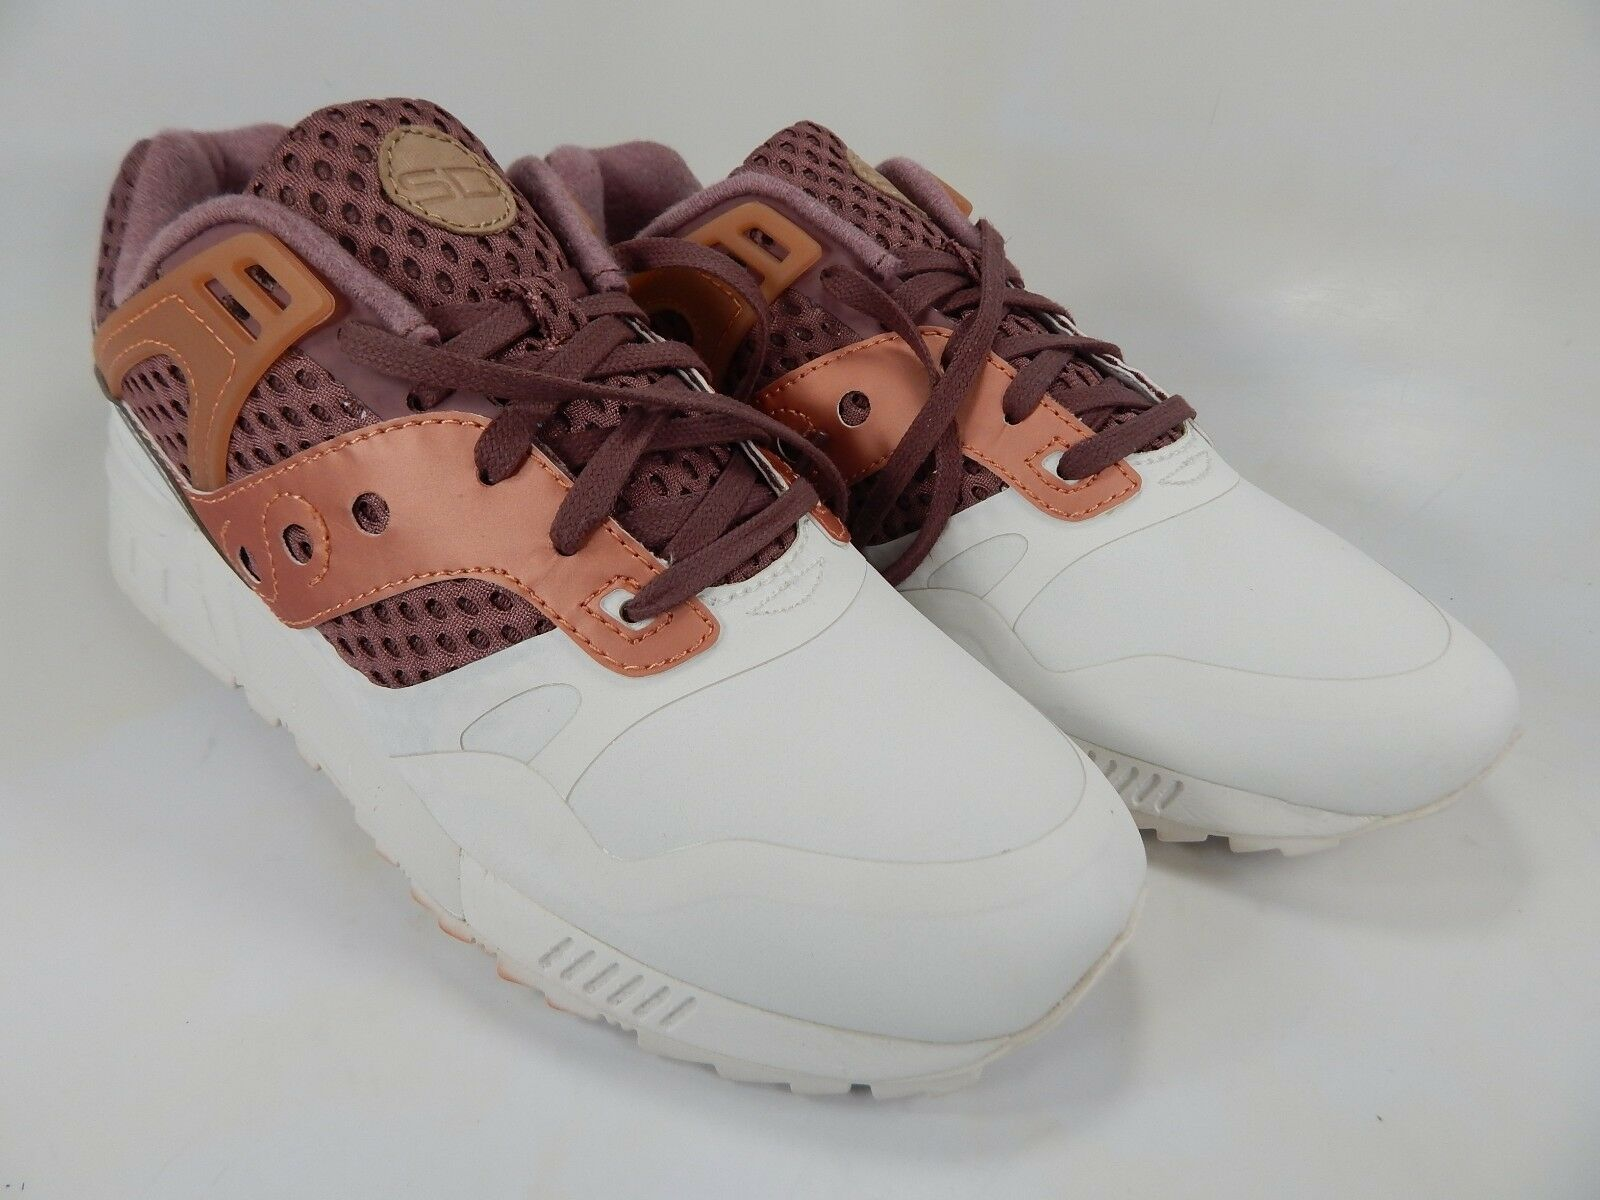 a8418a6378c1 Saucony Grid SD HT Original Running Shoes Men s Size Size Size 9 M Tan  S70388-